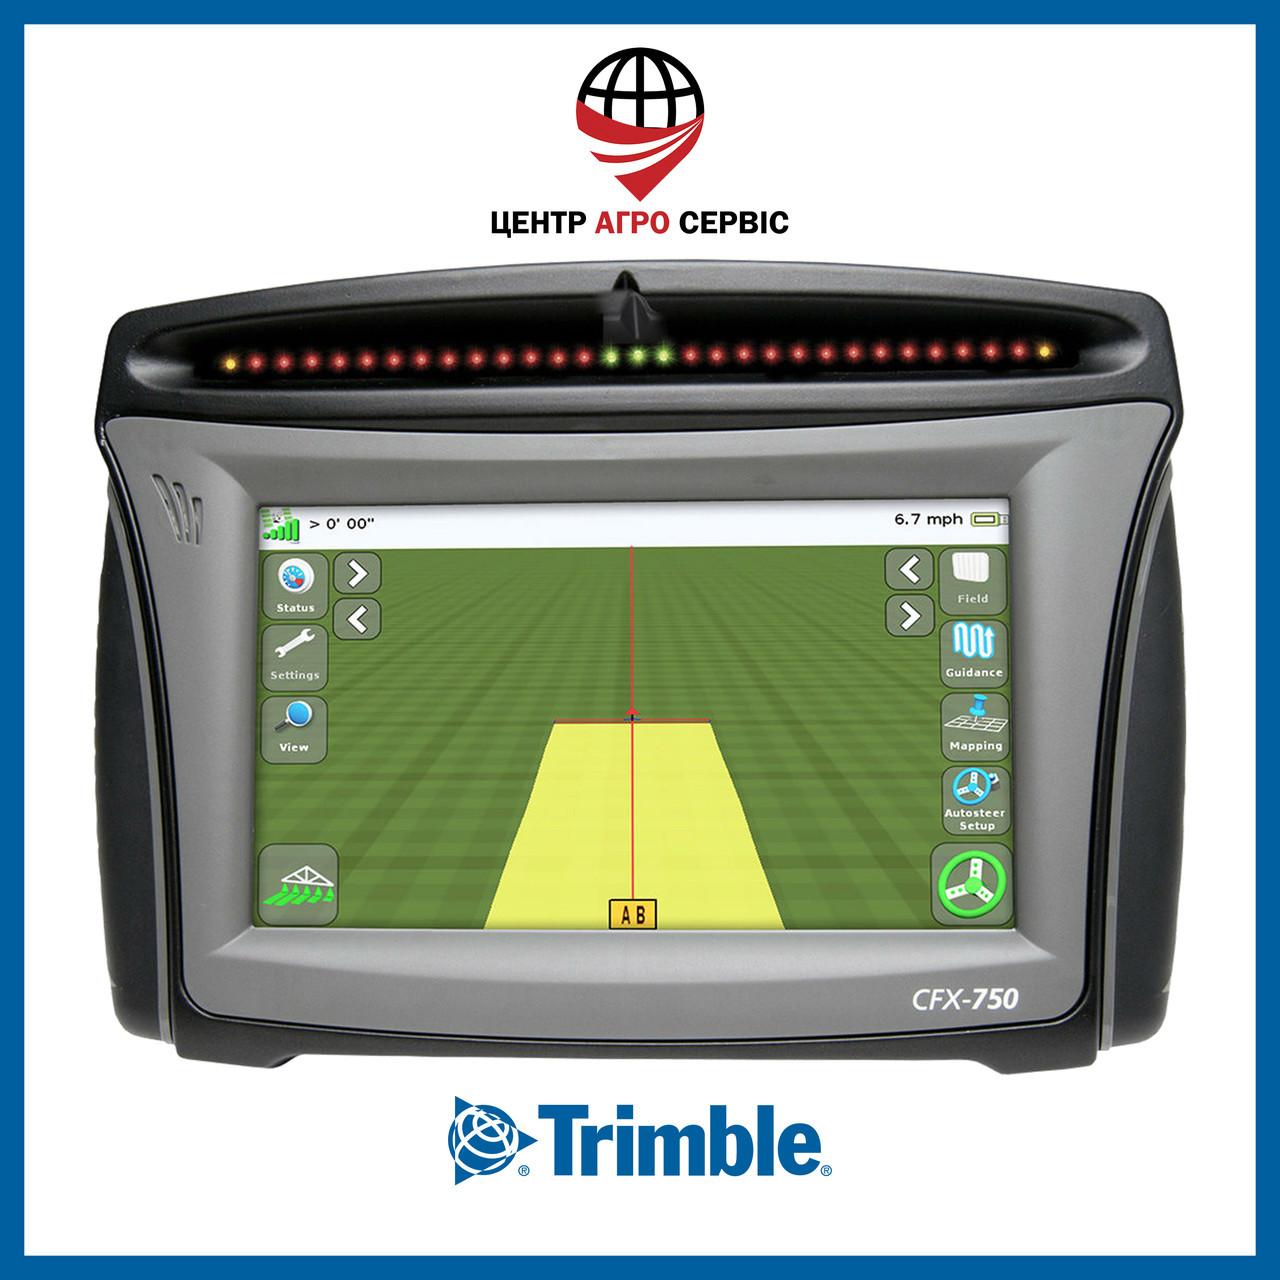 Gps навигатор для трактора (навигатор для поля, сельхоз навигатор)  Trimble  CFX 750 Lite